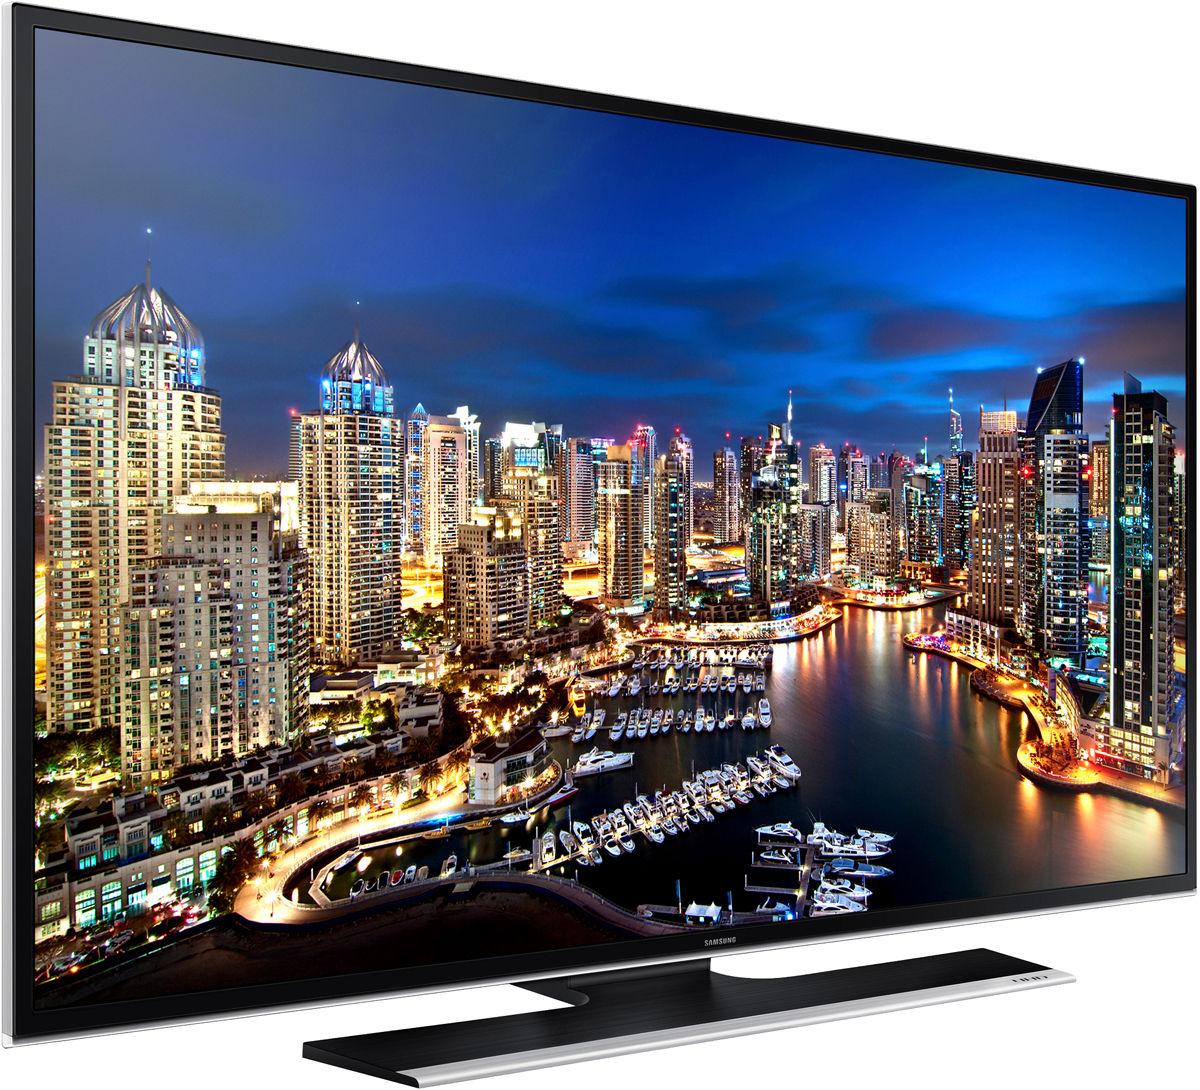 http://www.son-video.com/images/dynamic/Televiseurs/articles/Samsung/SAMSUE40HU6900/Samsung-UE40HU6900_3QG_1200.jpg